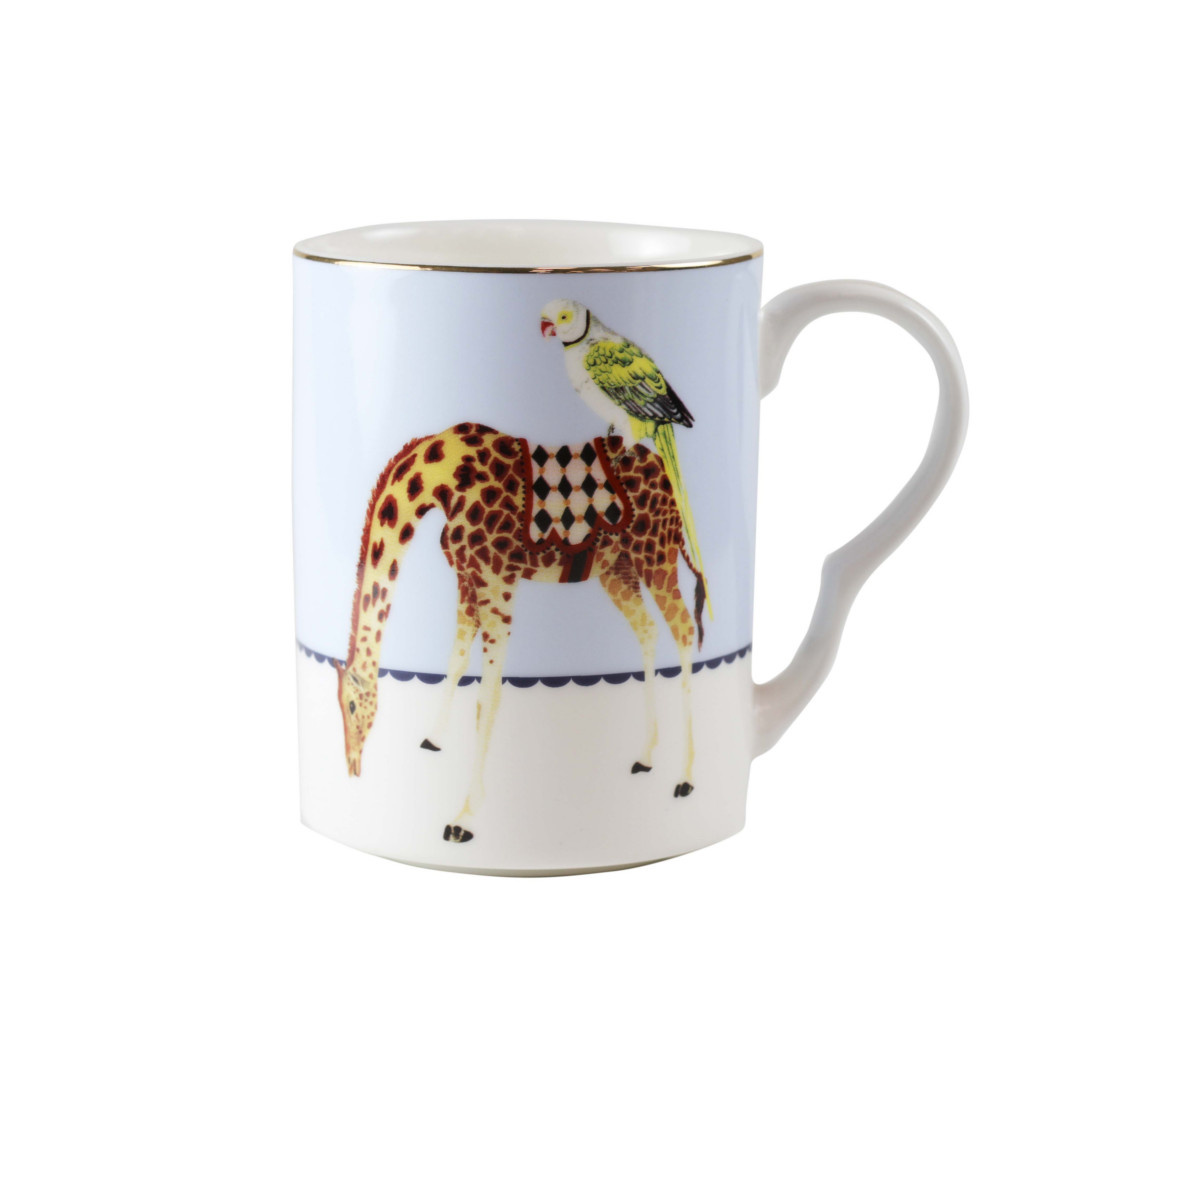 Yvonne Ellen London Yvonne Ellen Carnival Animal Set van 2 Mokken 375 ml - Giraf & Olifant Prints - Bone China Porselein - In Fraaie Geschenkdoos